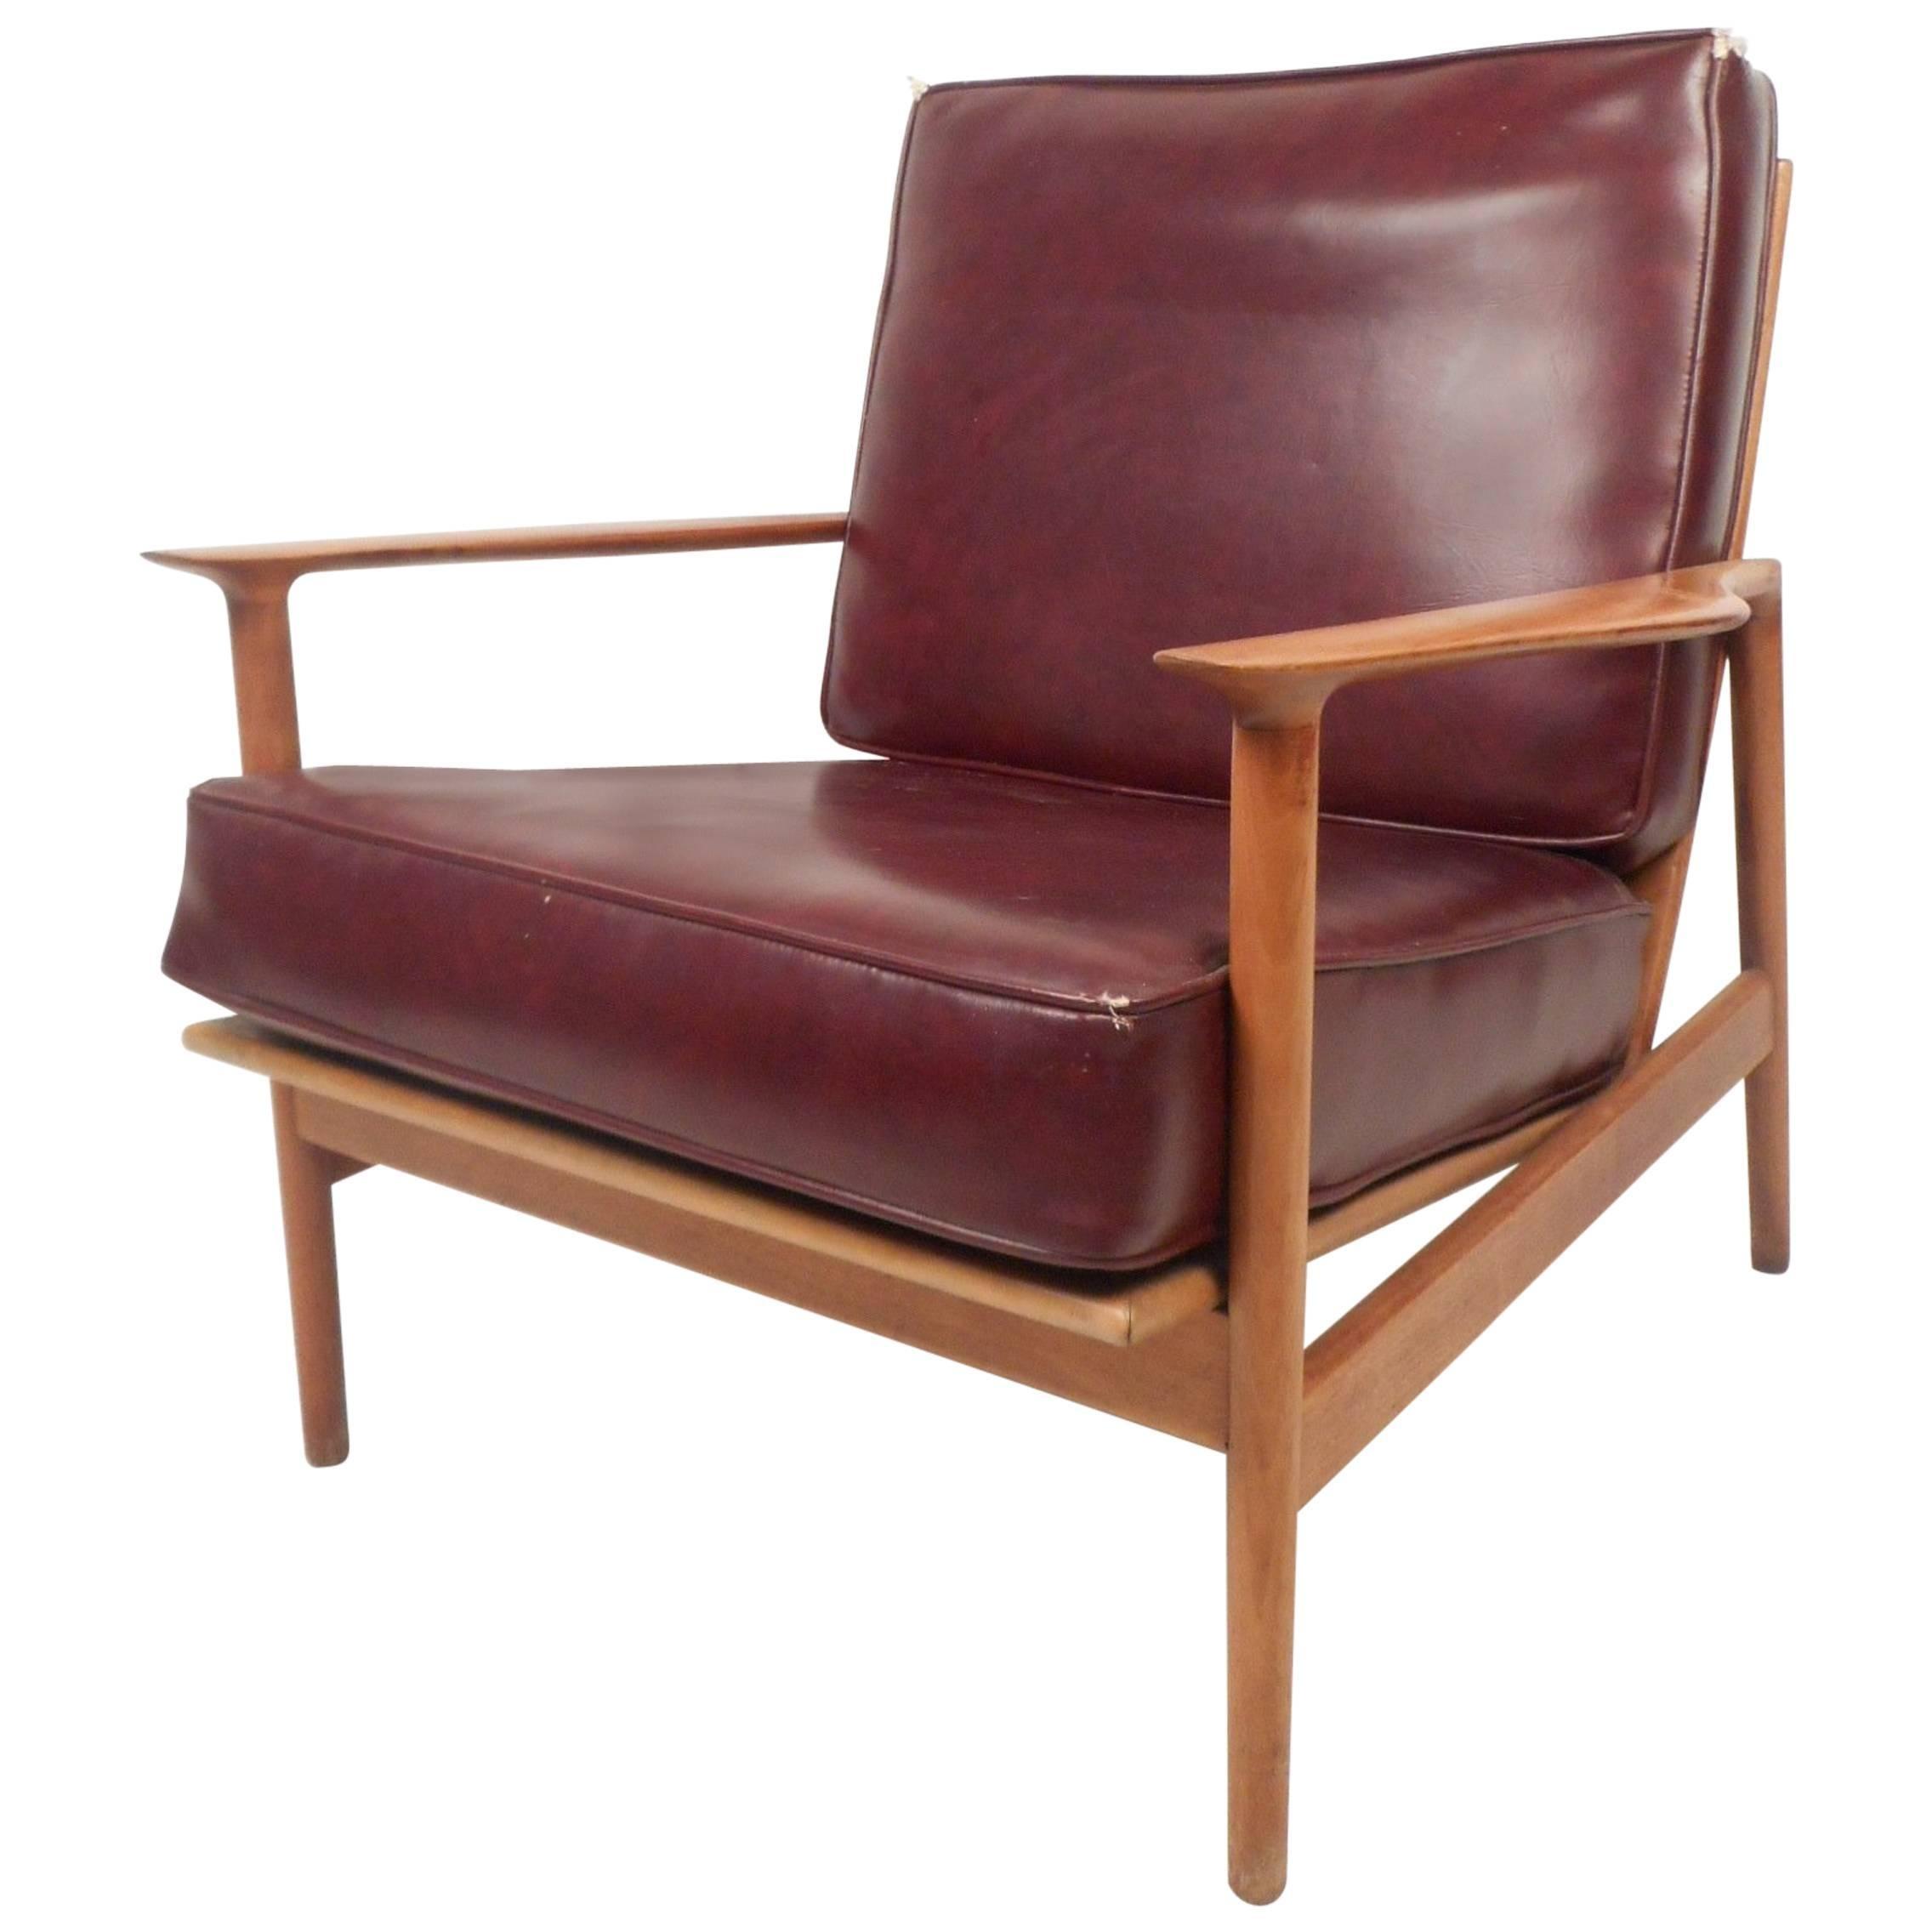 Mid-Century Modern Danish Teak Lounge Chair